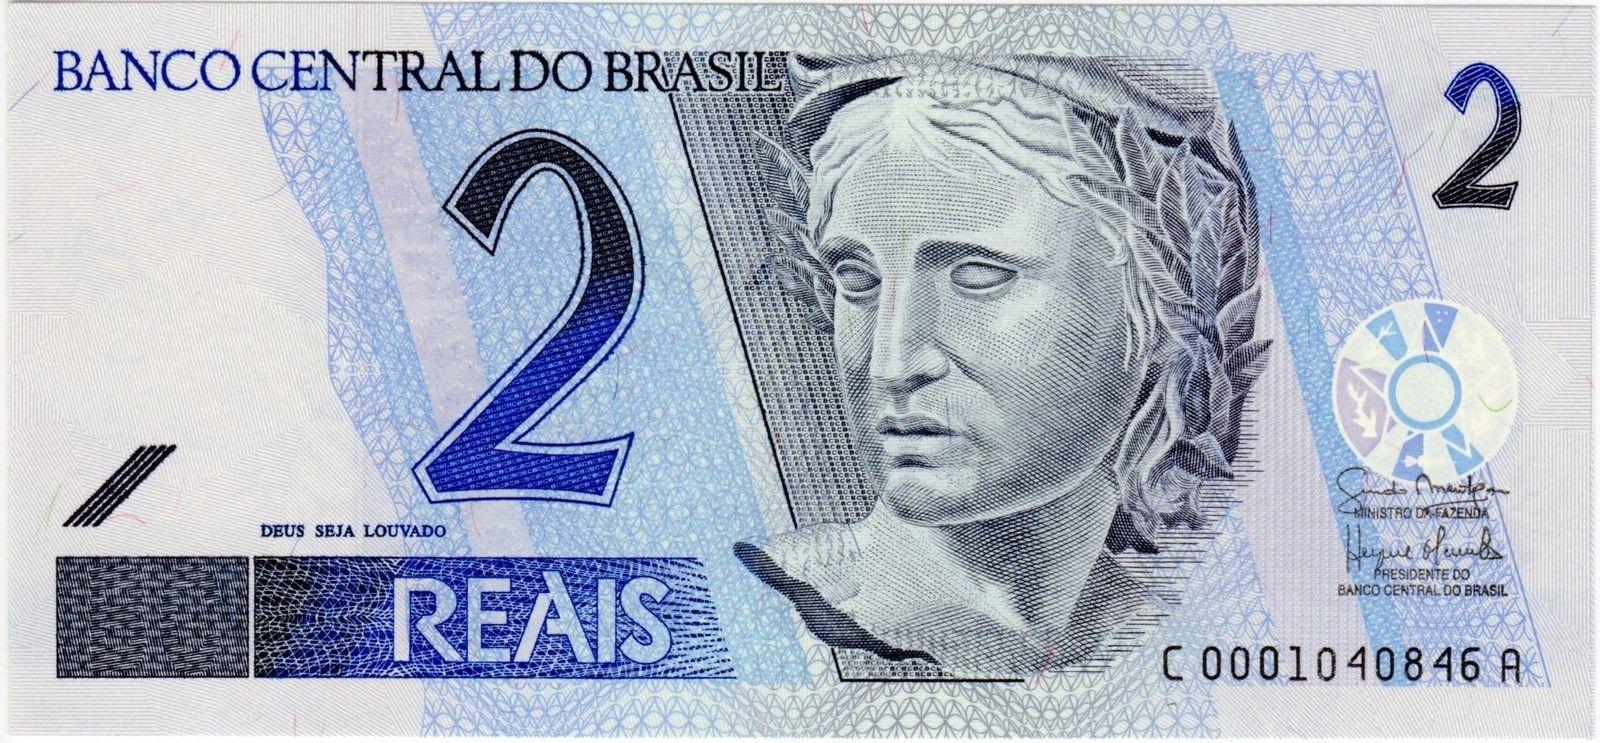 Brazil 2 Reais banknote 2010|World Banknotes & Coins ...